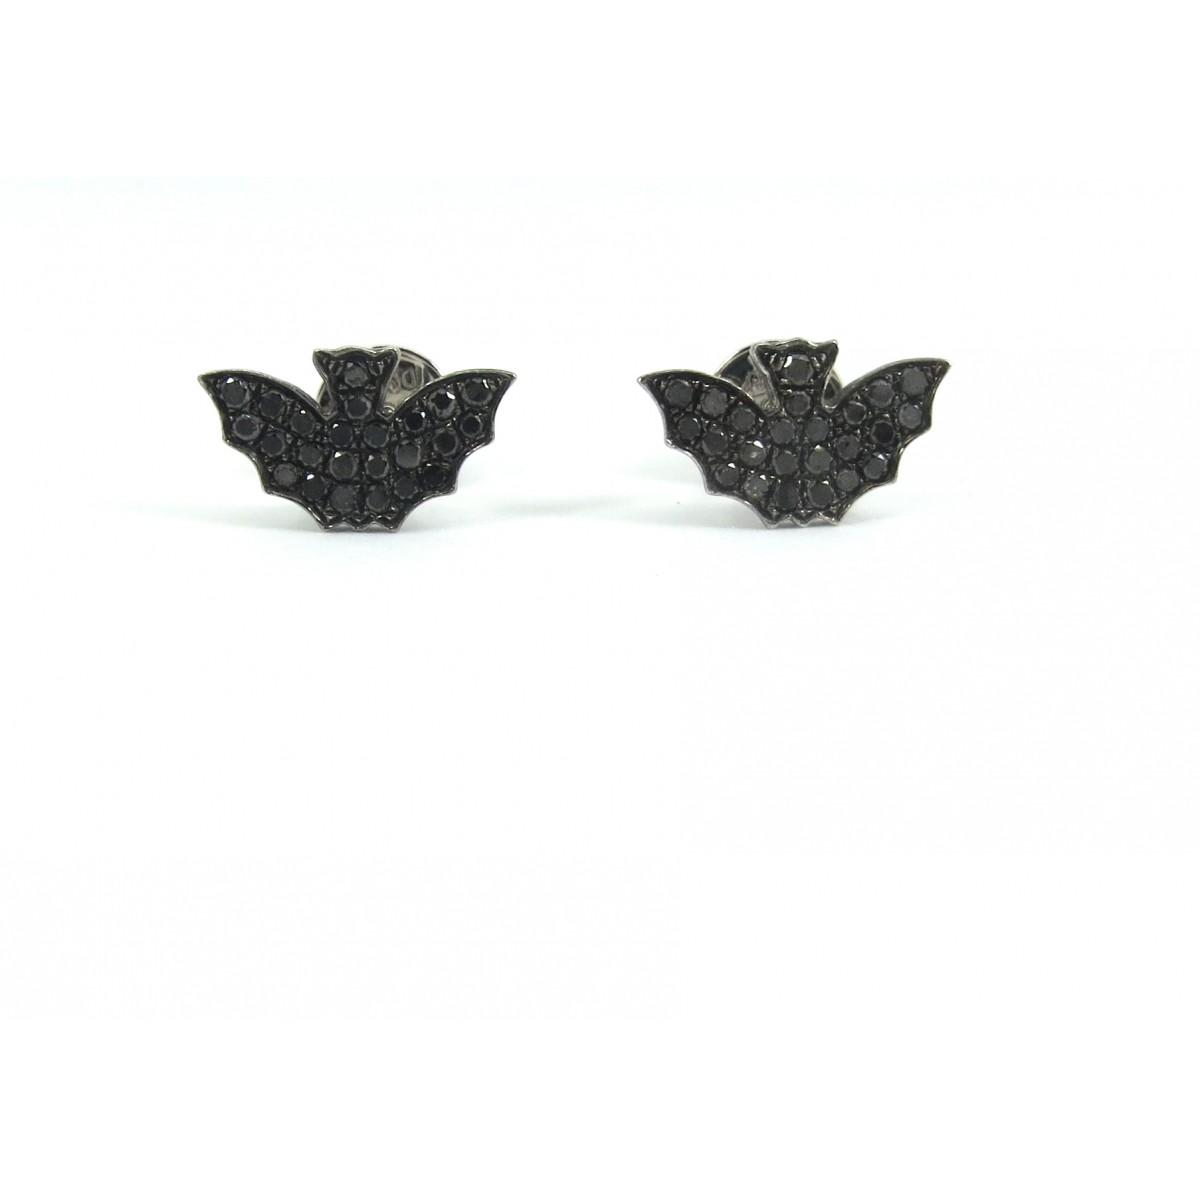 Brinco Morcego Ouro Branco 18k e Diamantes Negros  - Sancy